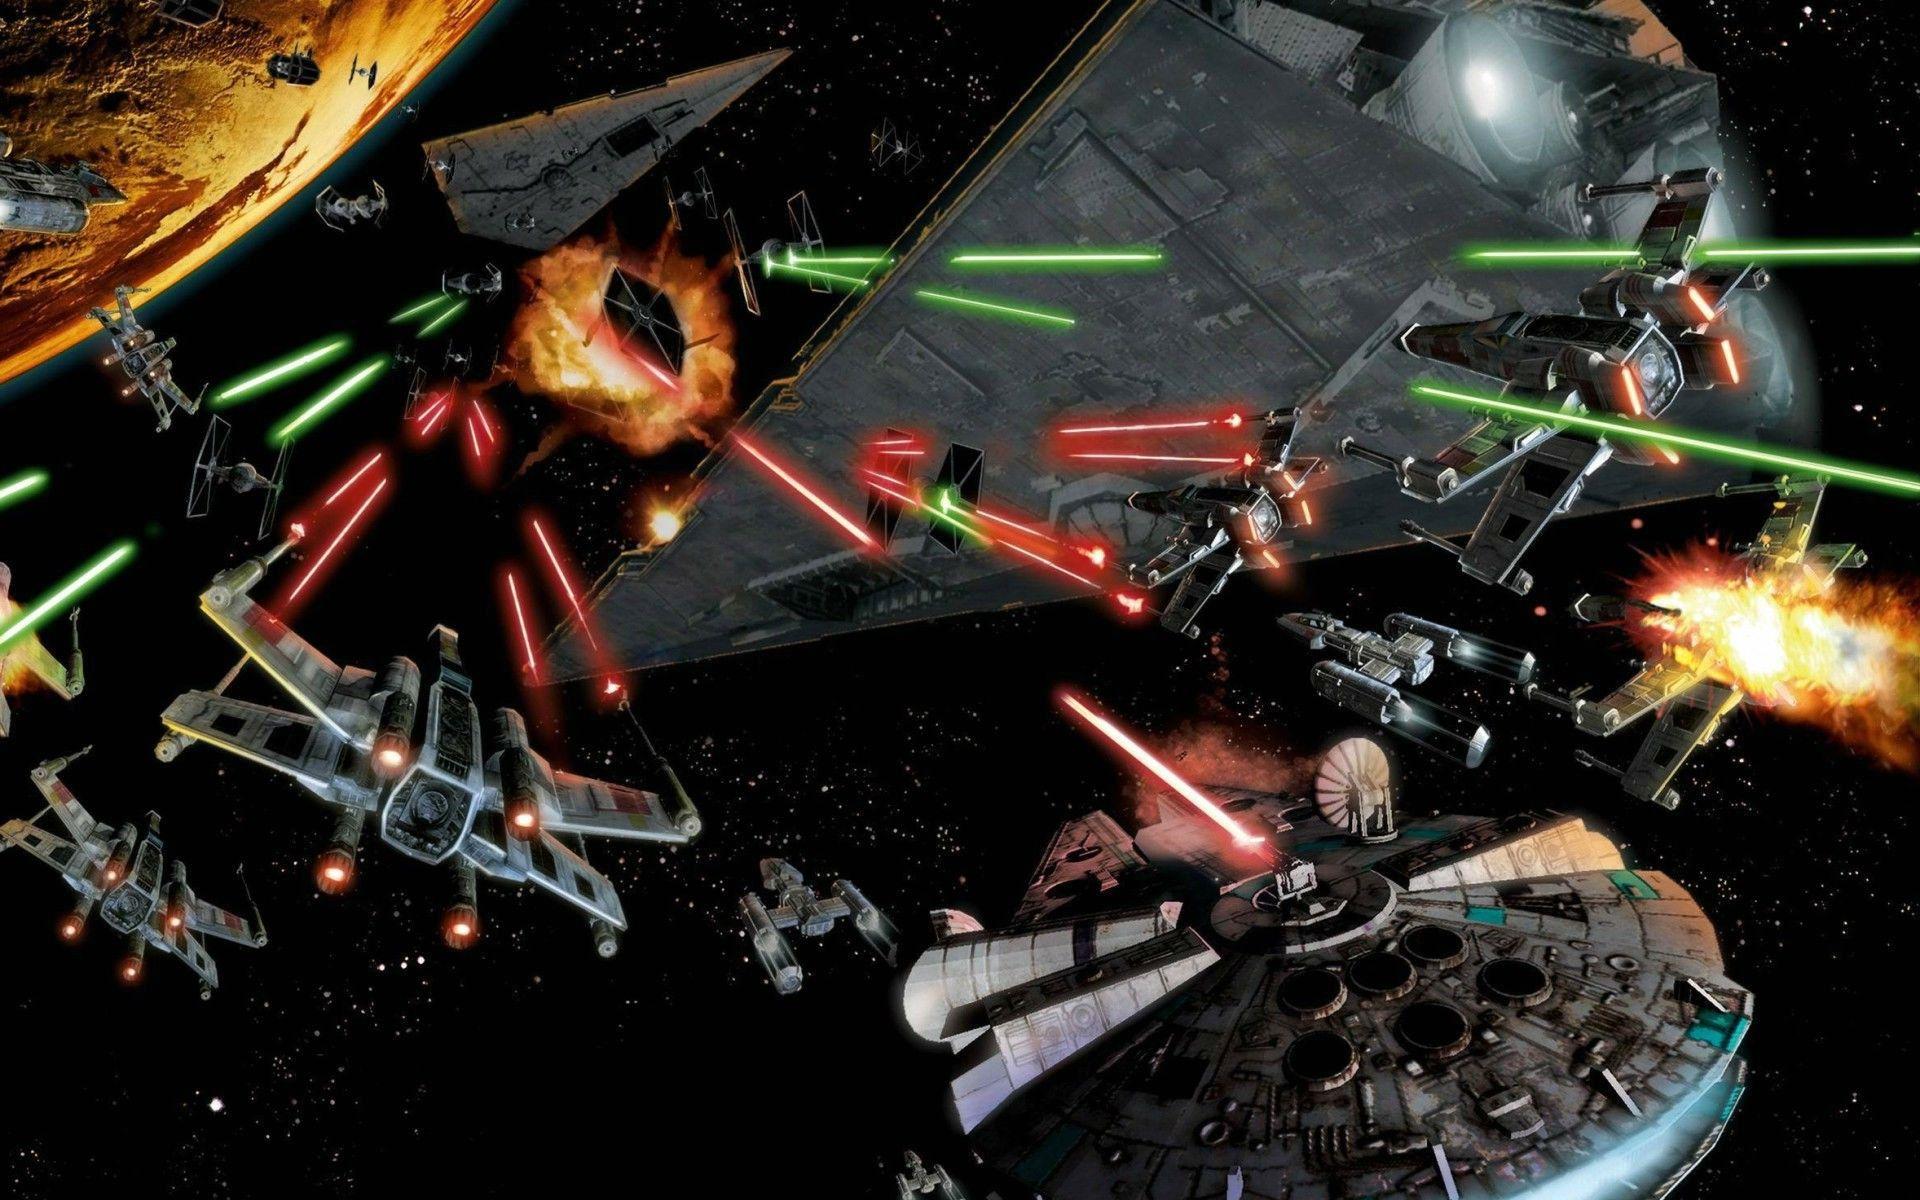 King Size ×Inch Star Wars Millennium Falcon Blanket 1920×1200 Millenium Falcon Backgrounds ( · Live WallpapersWallpaper ...